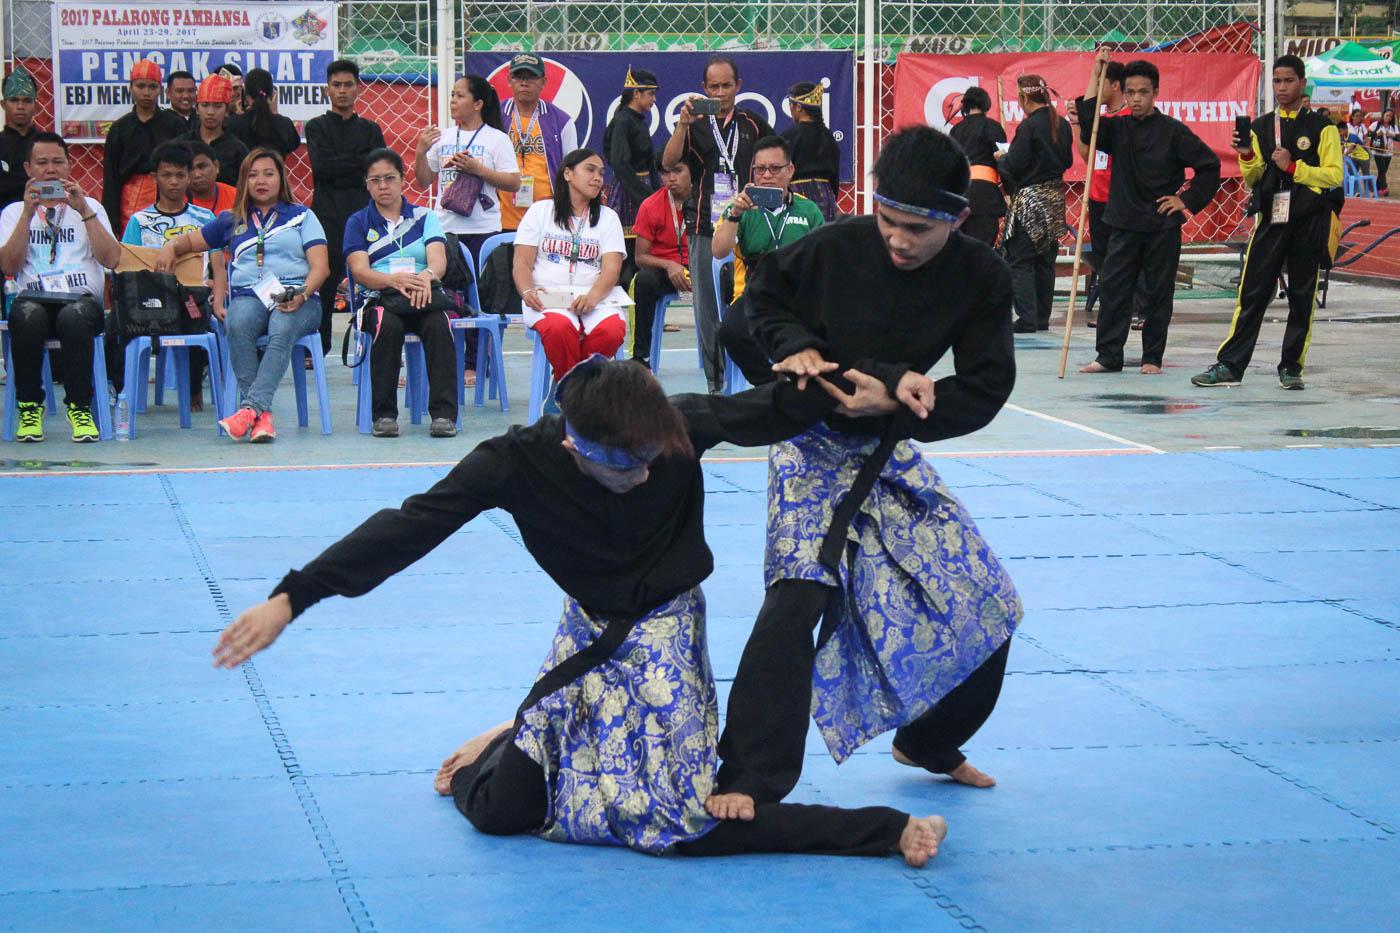 IN PHOTOS: Pencak Silat makes debut in Palarong Pambansa 2017